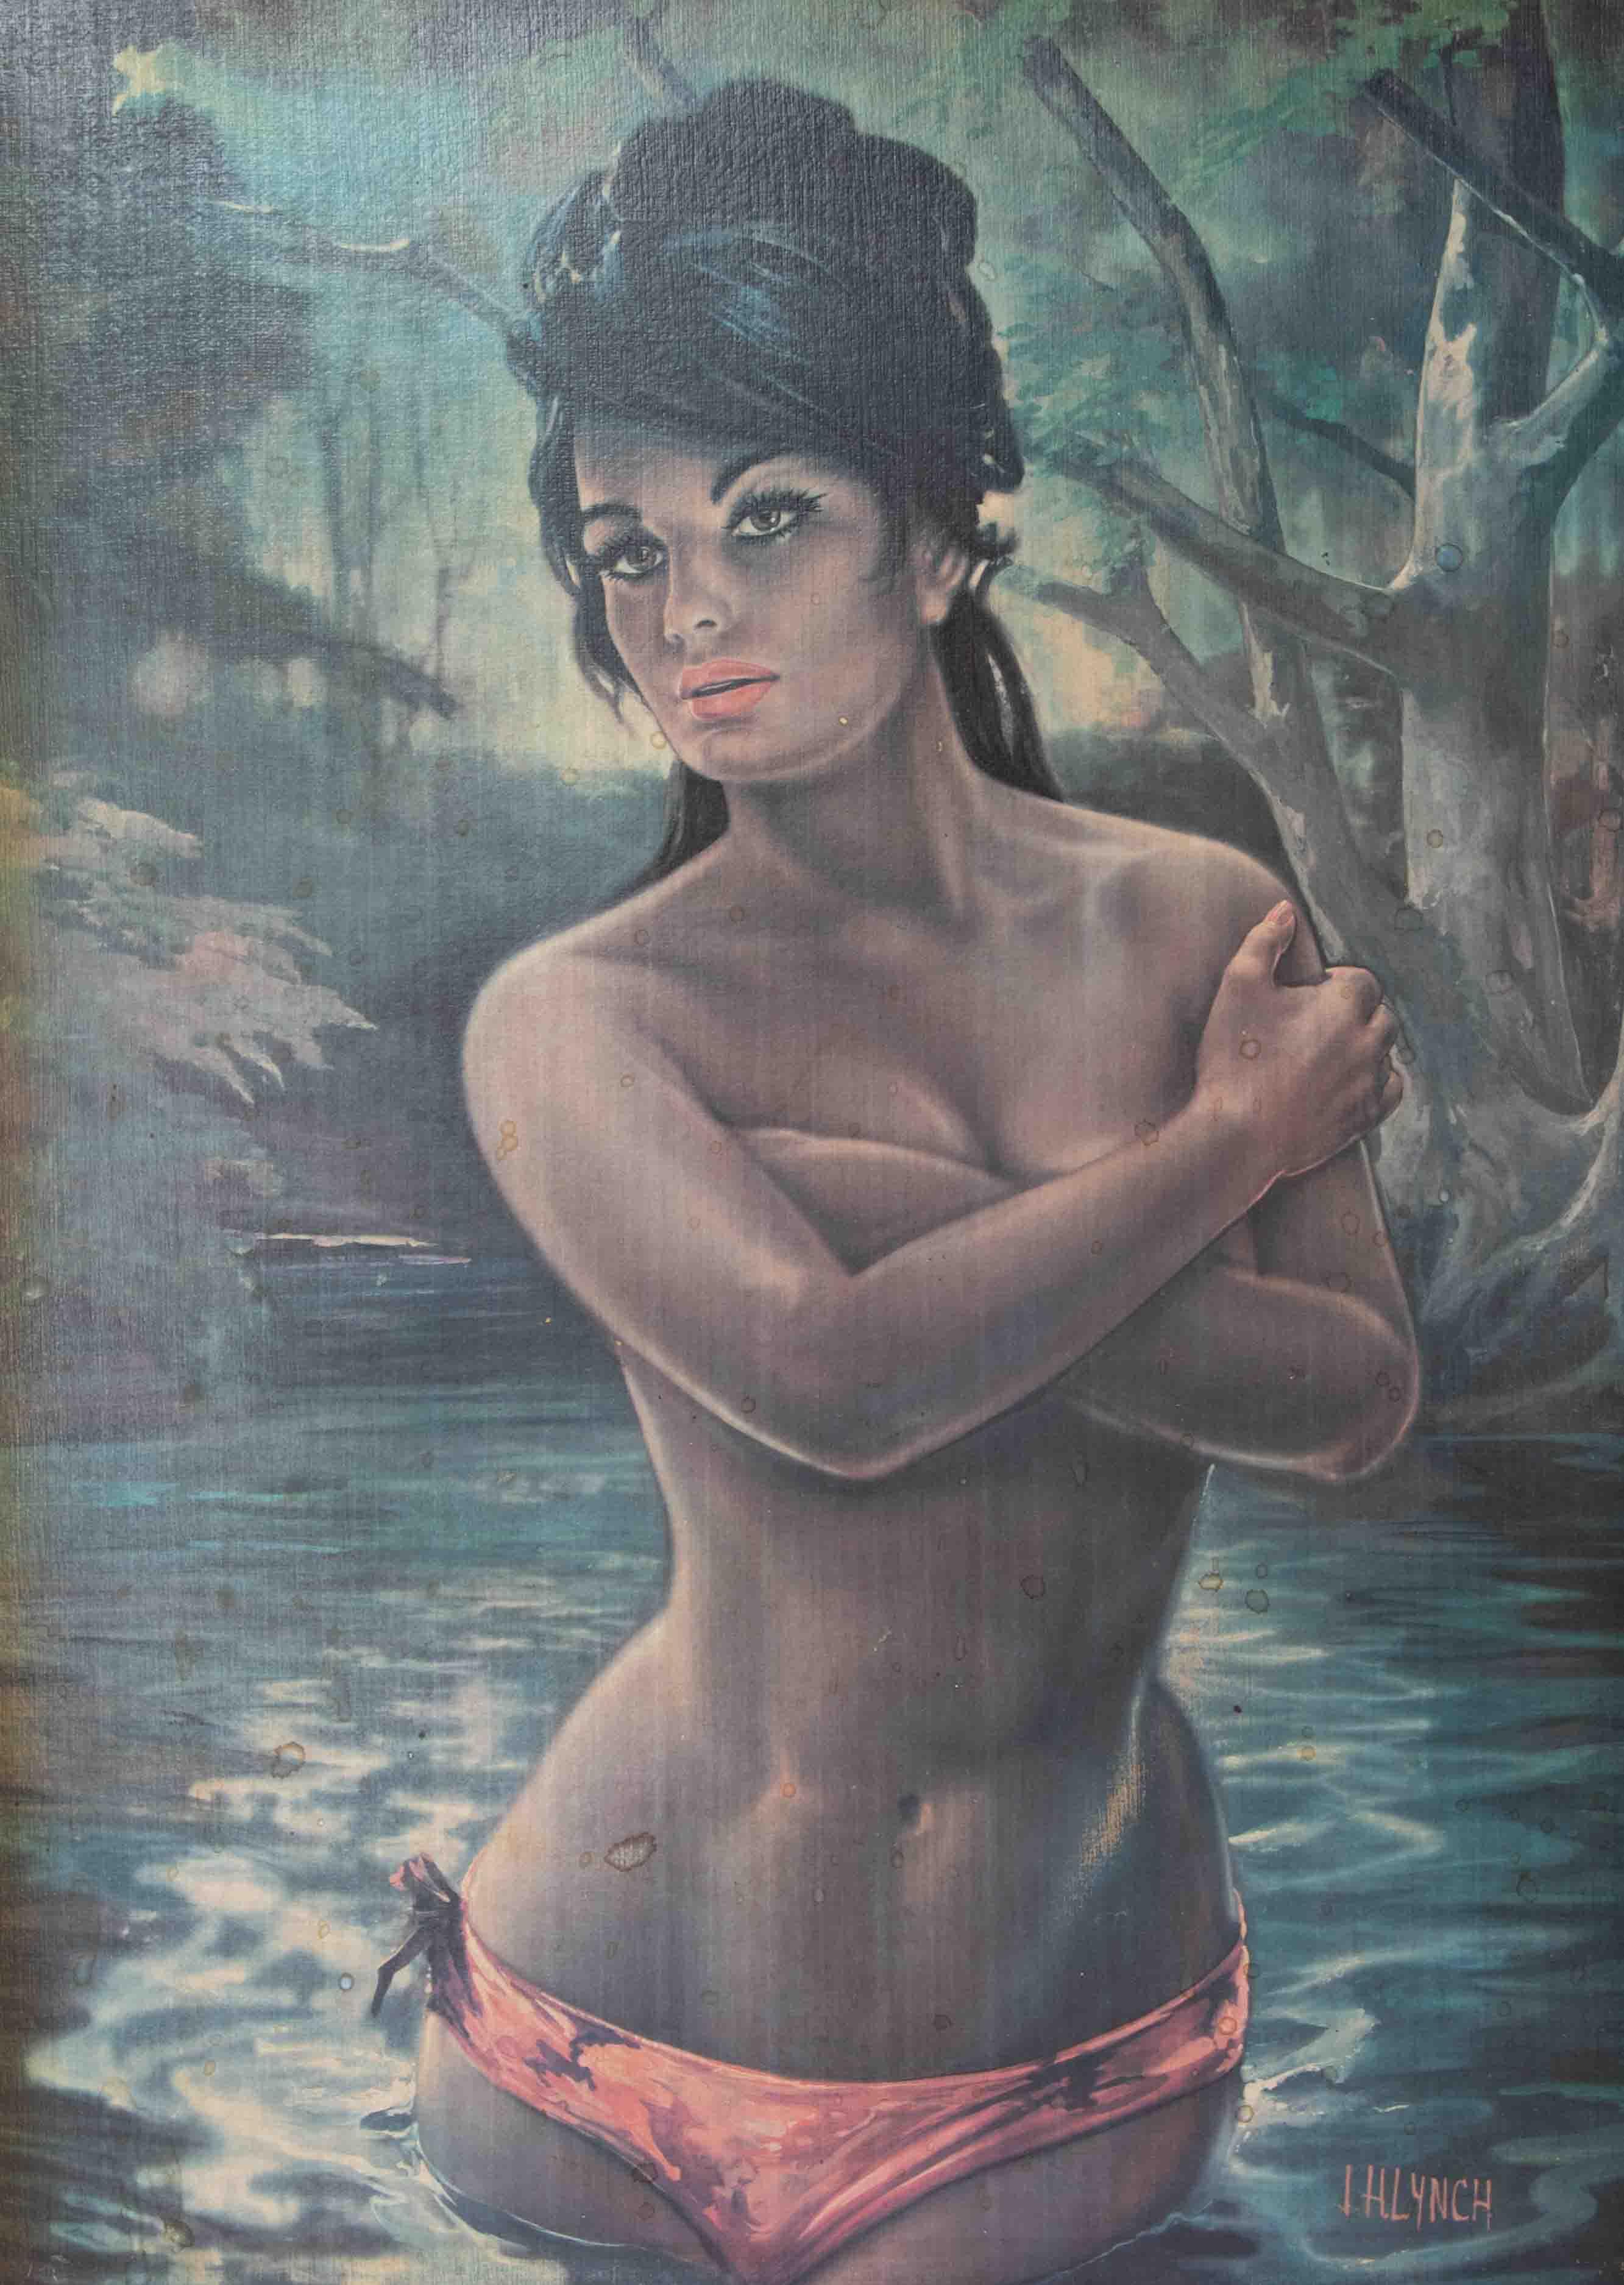 J.Lynch, 'Nymph' print, 68cm x 49cm, framed. - Image 2 of 2